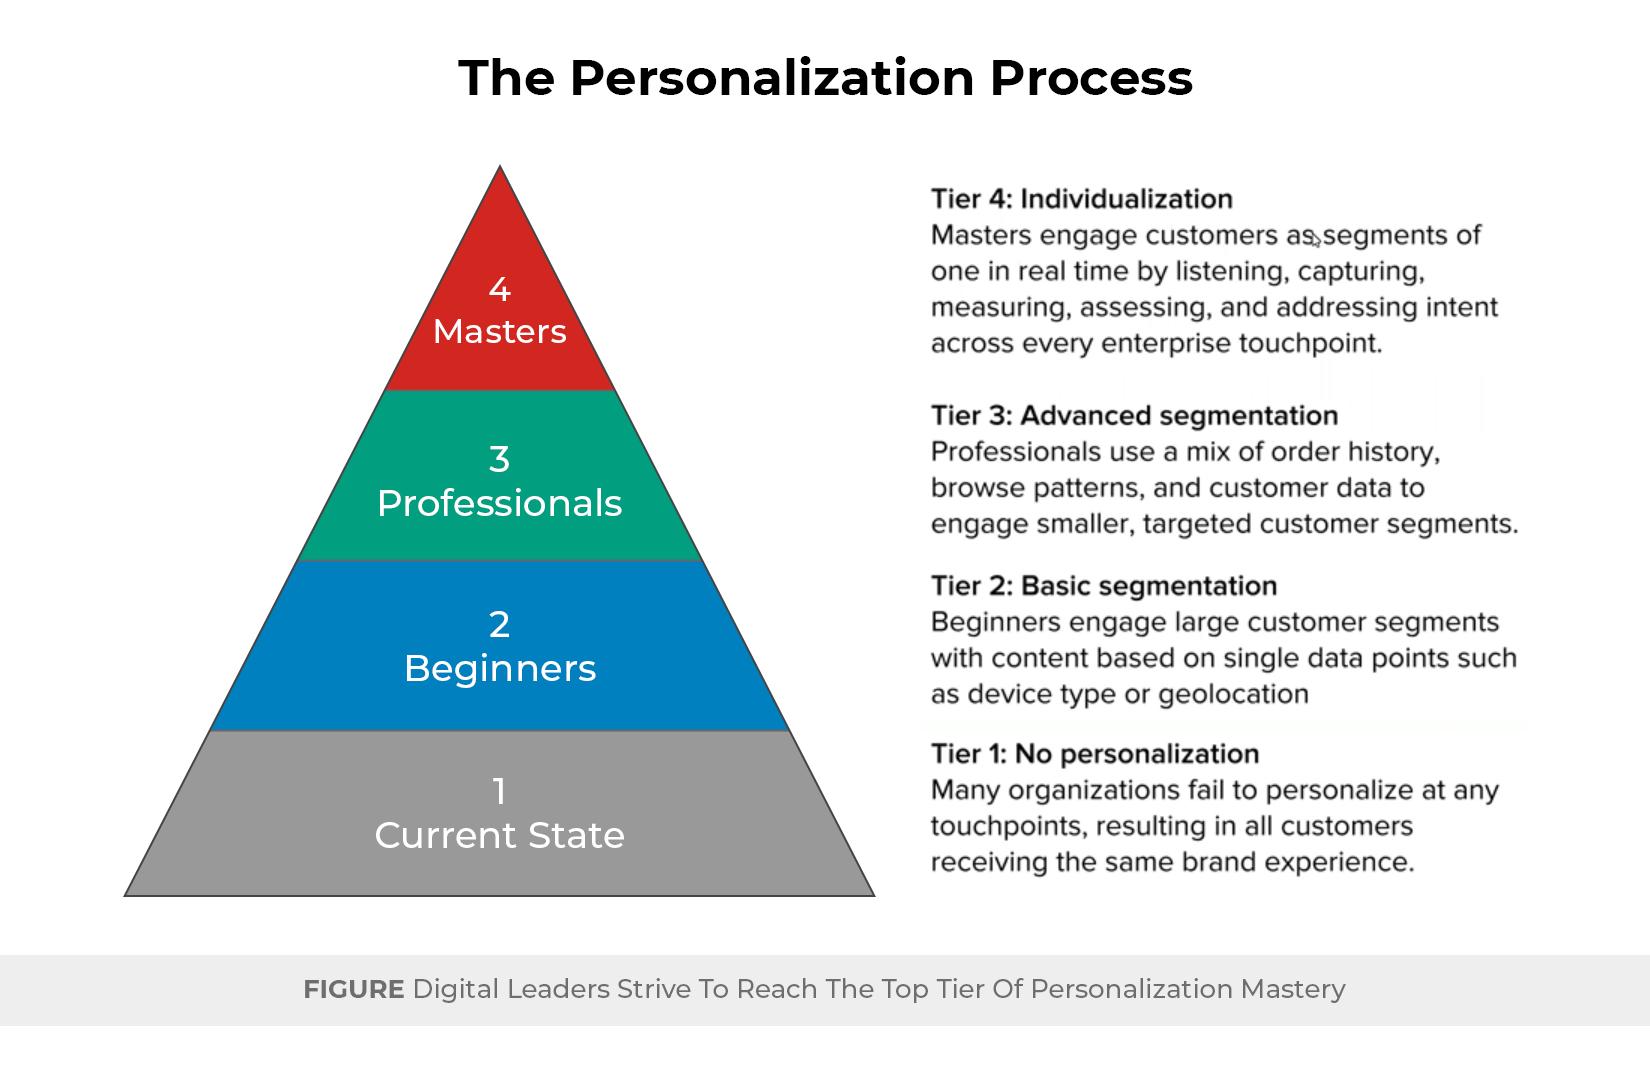 The Personalization Process